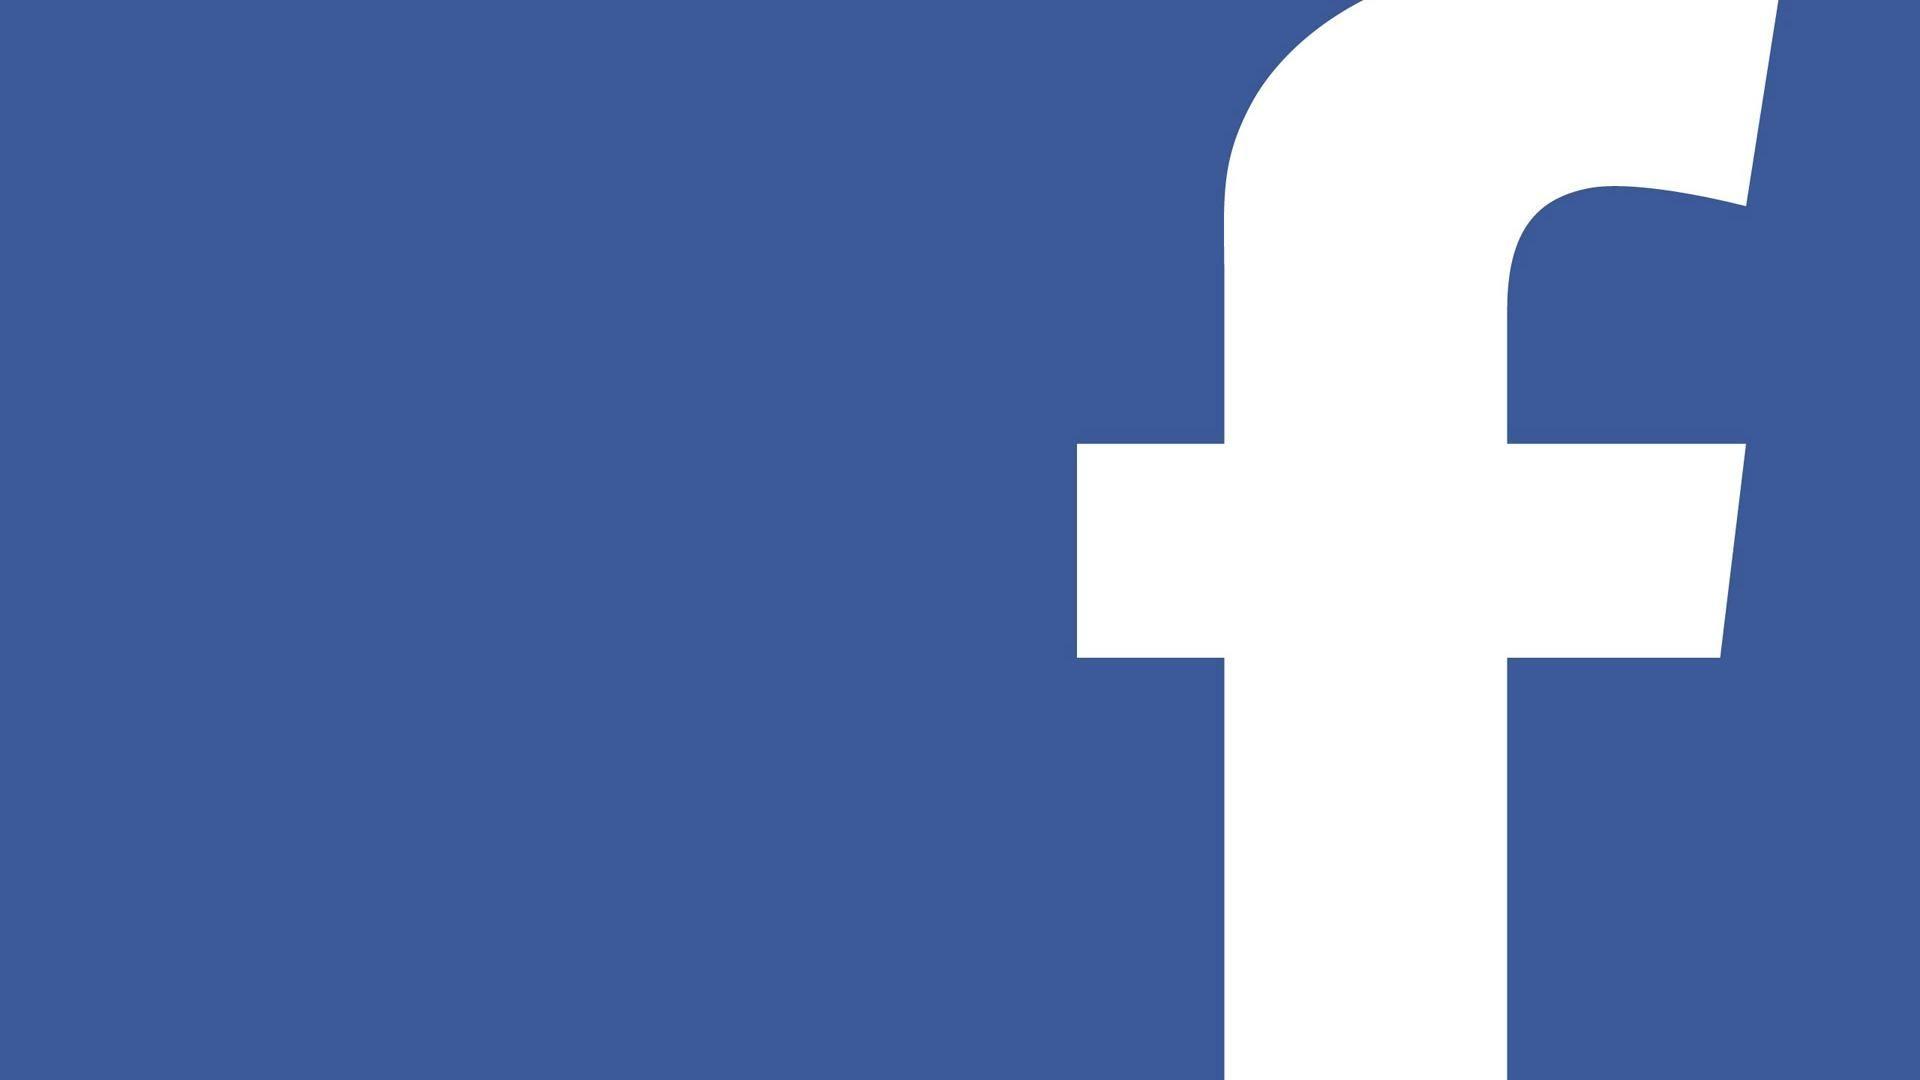 New Wallpaper For Facebook Logo Download Wallpaper For Facebook